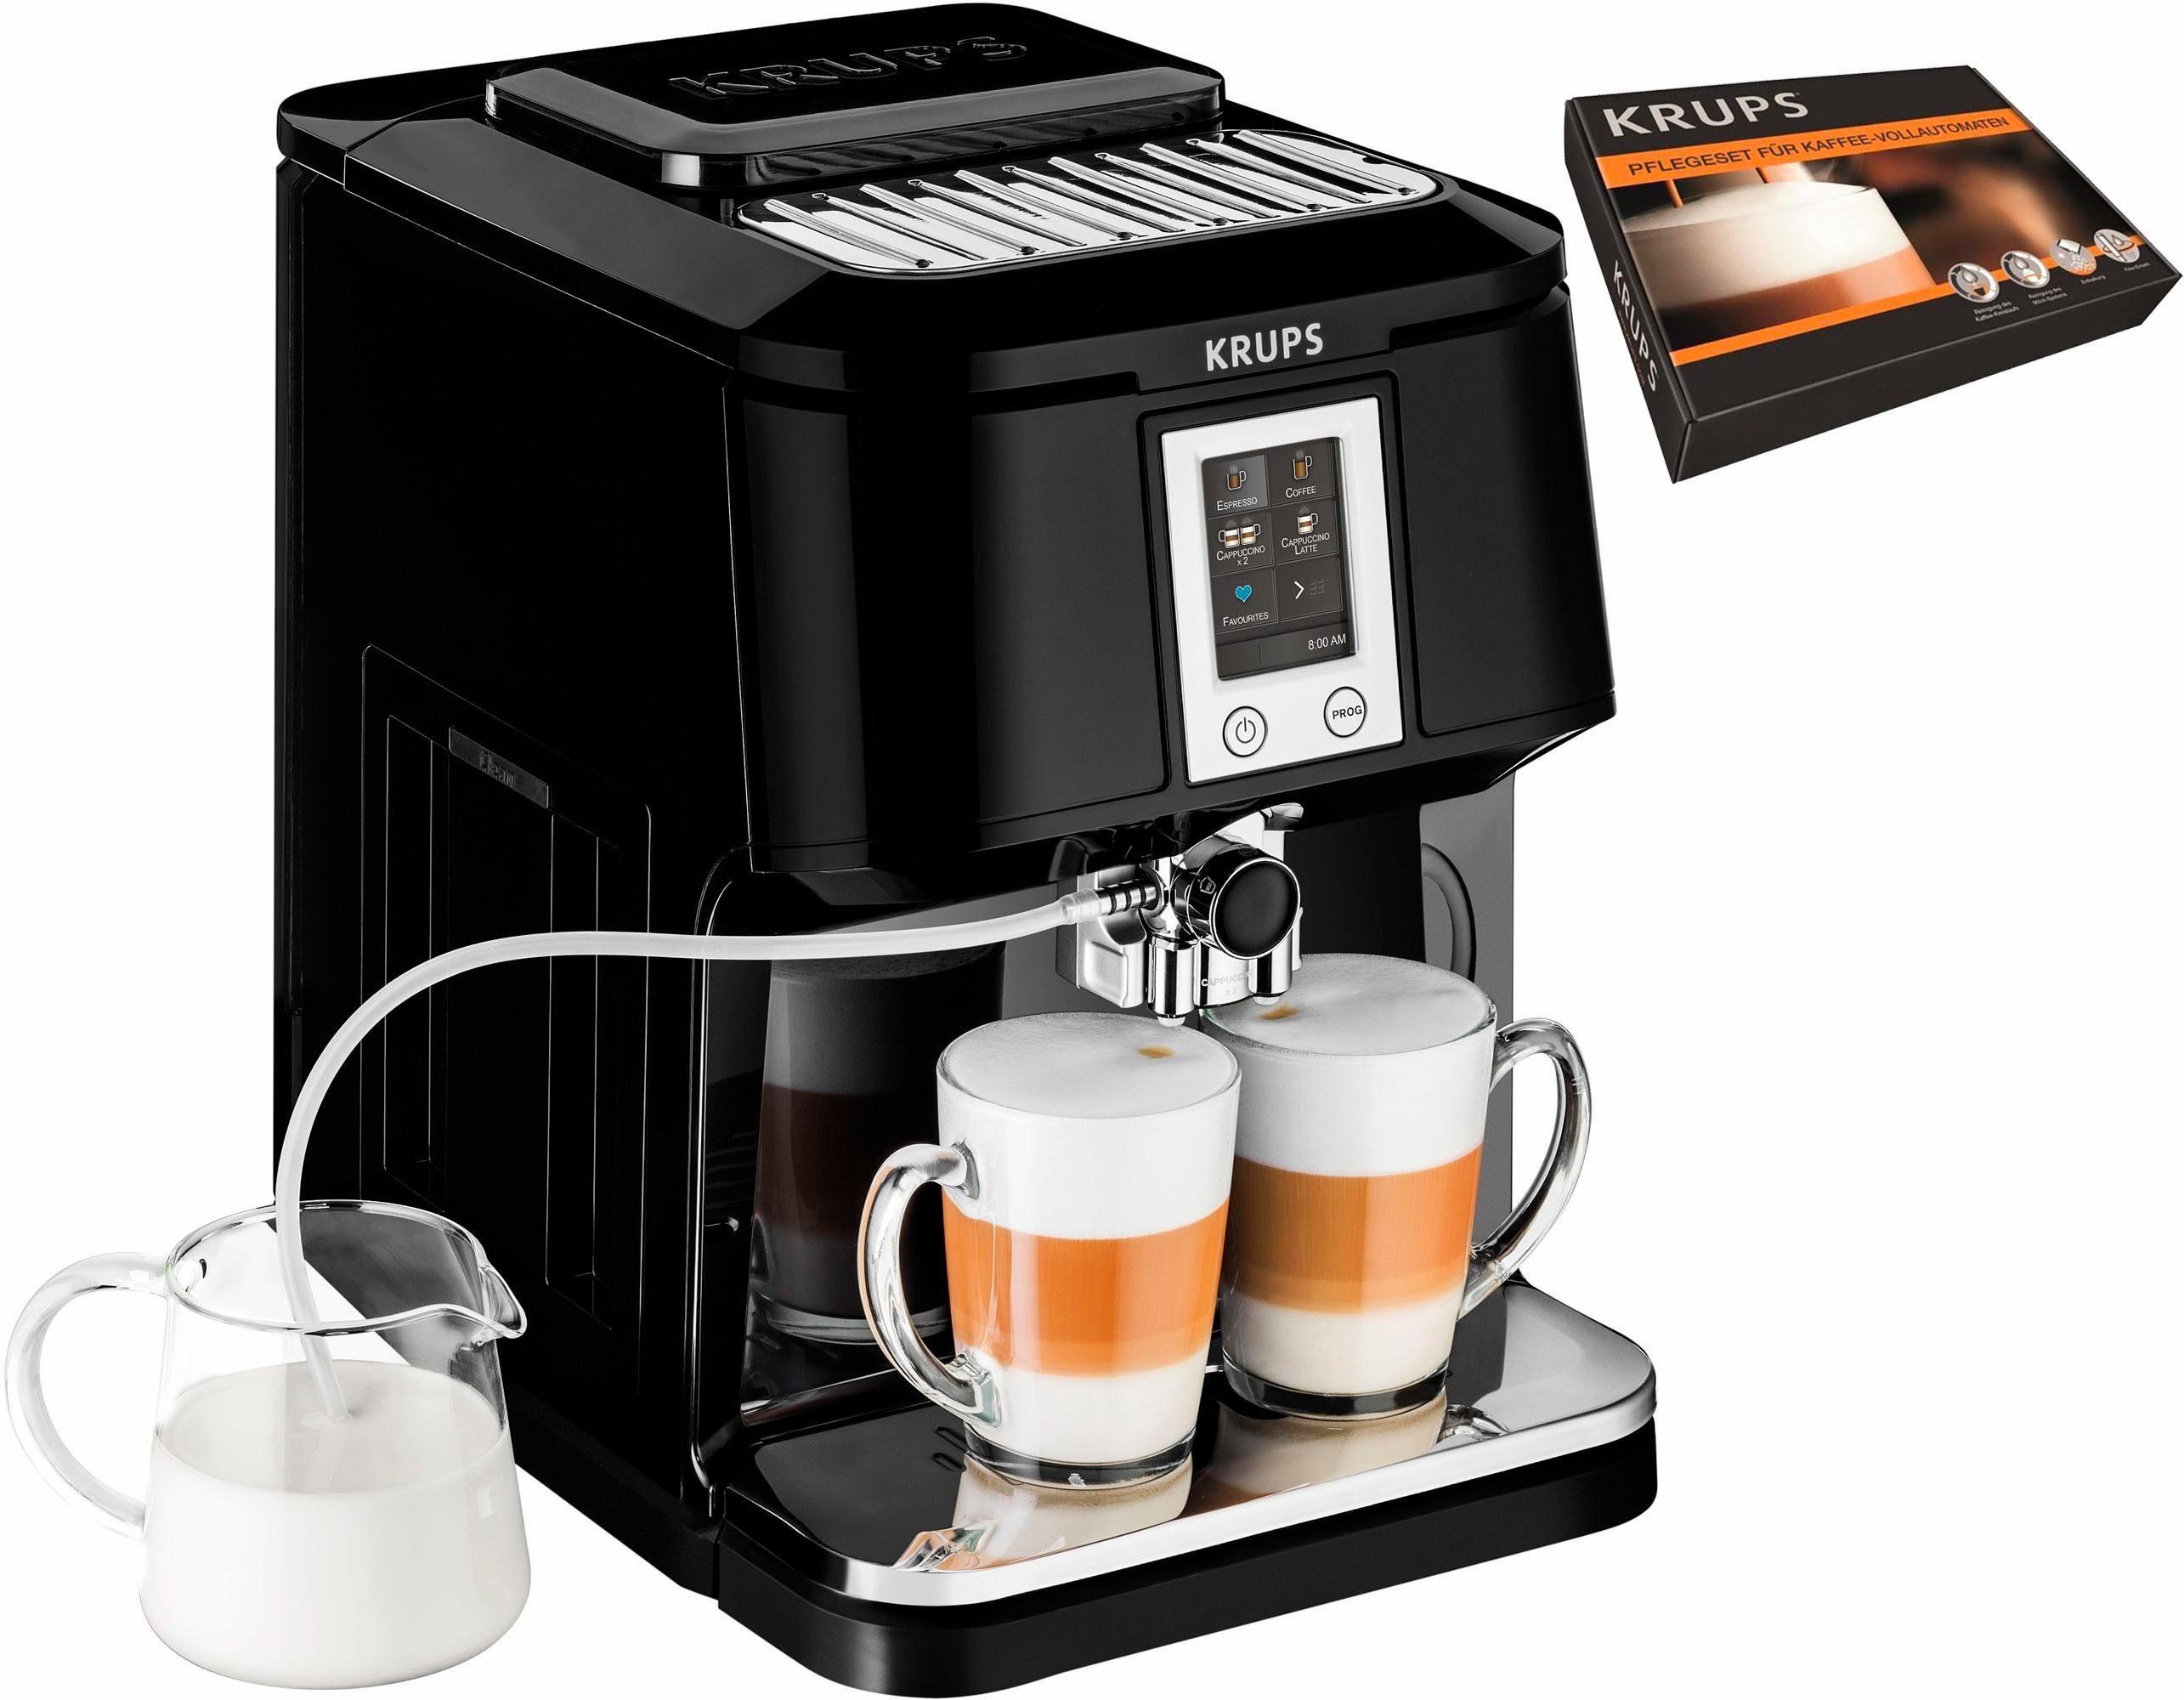 Krups Kaffeevollautomat EA8808 2-in-1 Touch Cappuccino, 1,7l Tank, Kegelmahlwerk, inkl. Krups Pflegeset im Wert von UVP 69,99